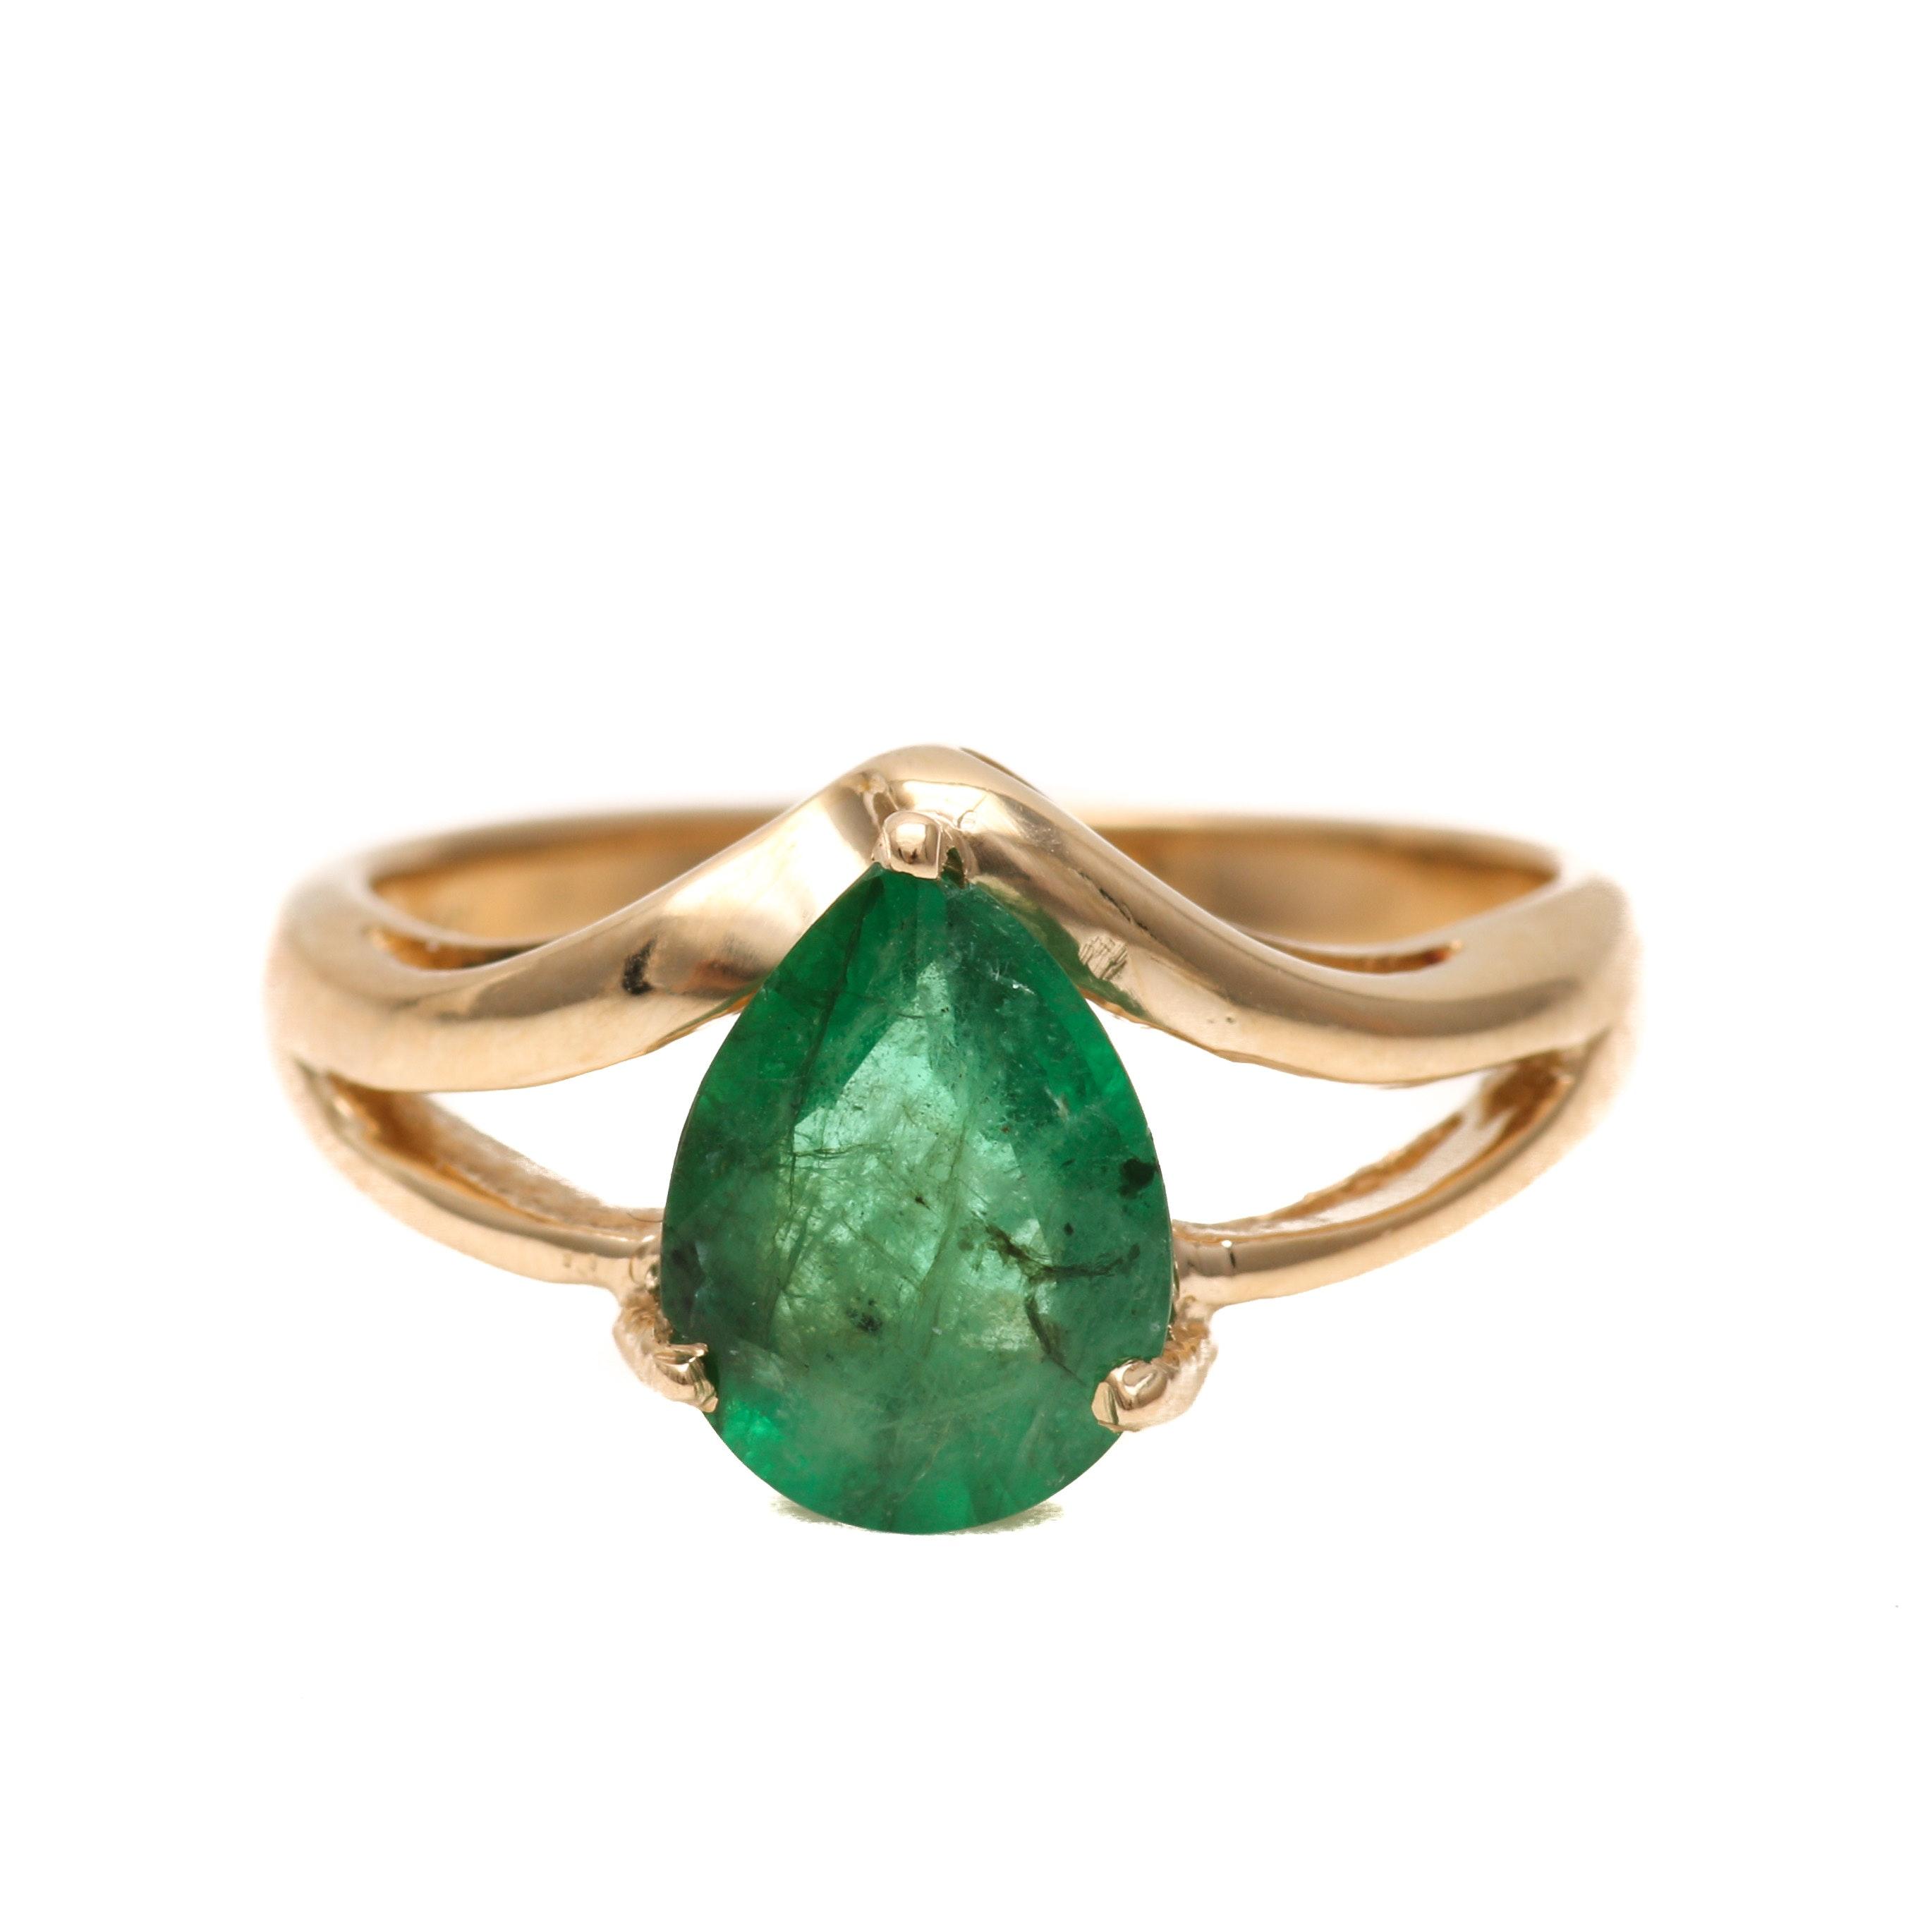 14K Yellow Gold 1.41 CT Emerald Ring